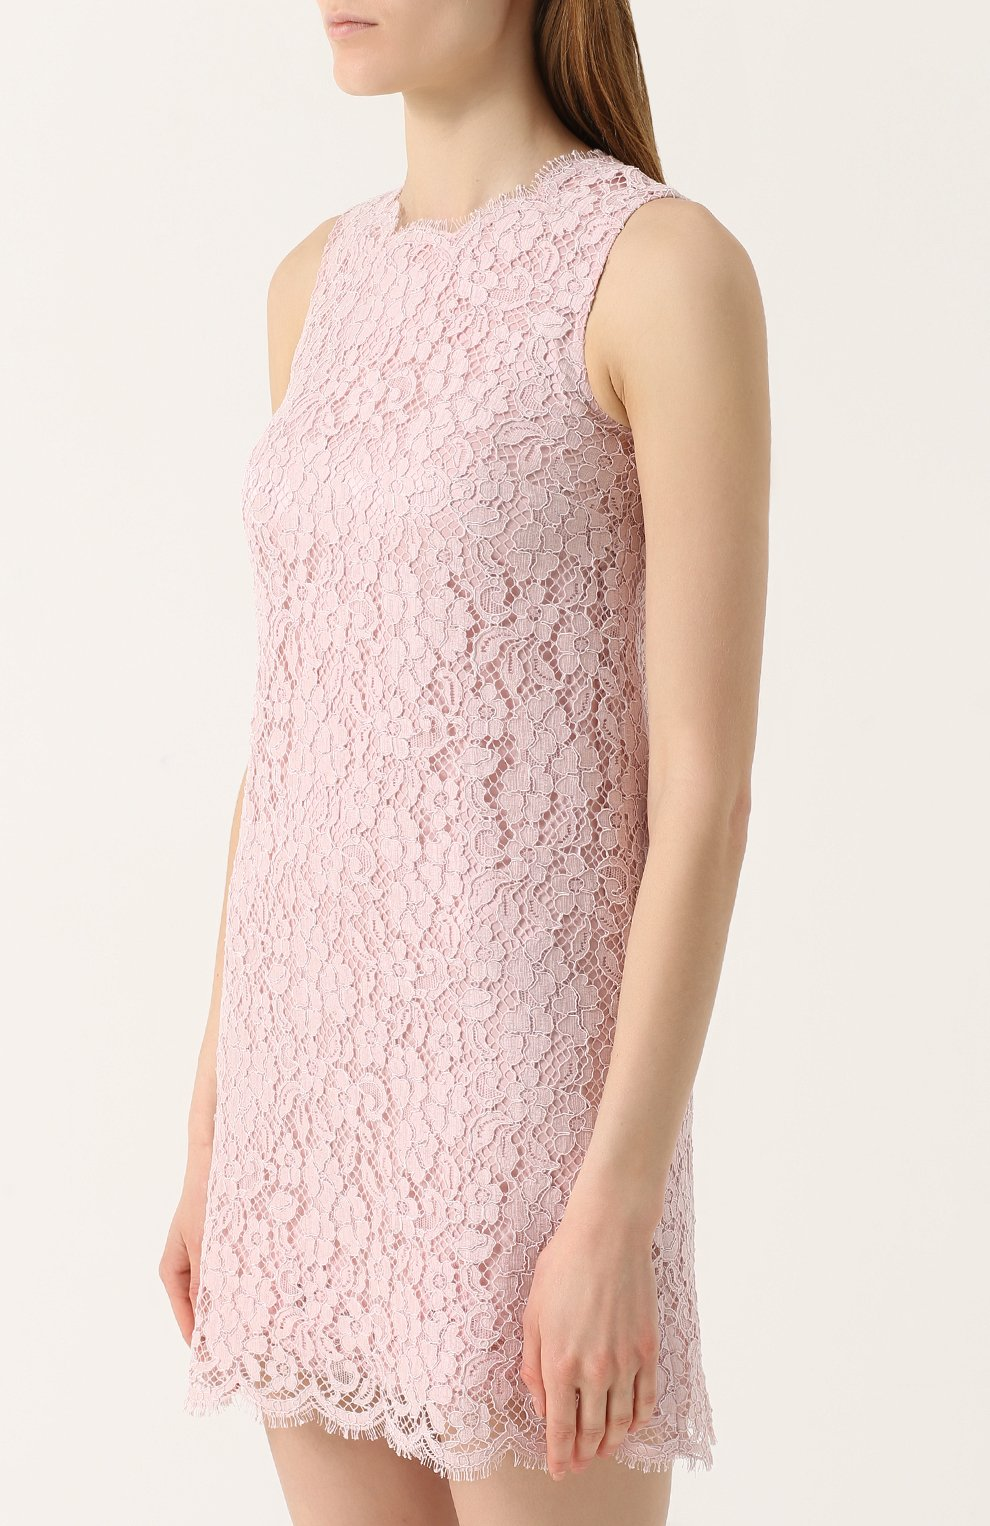 Кружевное мини-платье без рукавов Dolce & Gabbana розовое | Фото №4